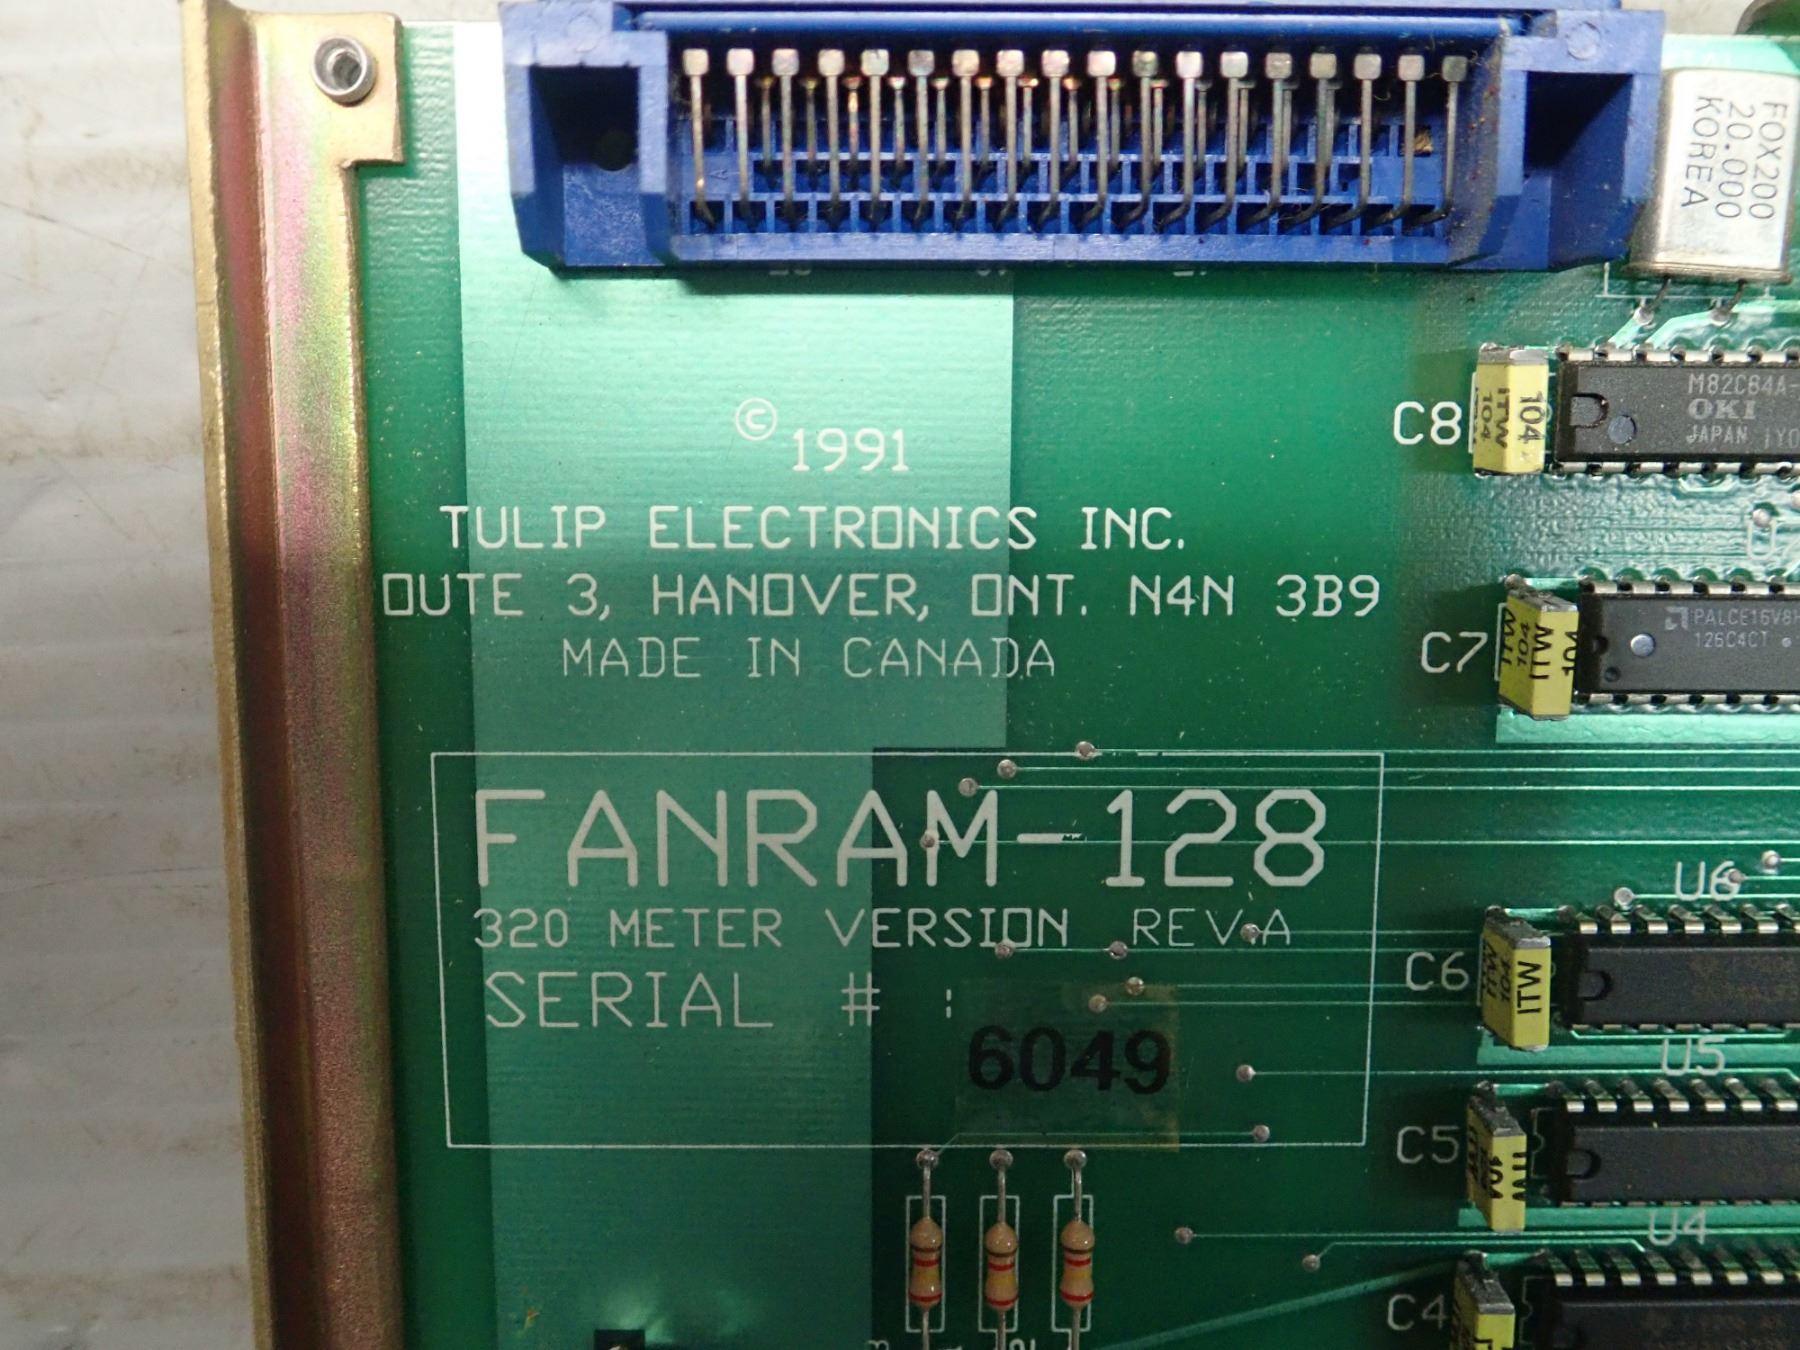 TULIP ELECTRONICS INC  FANRAM-A128 CIRCUIT BOARD